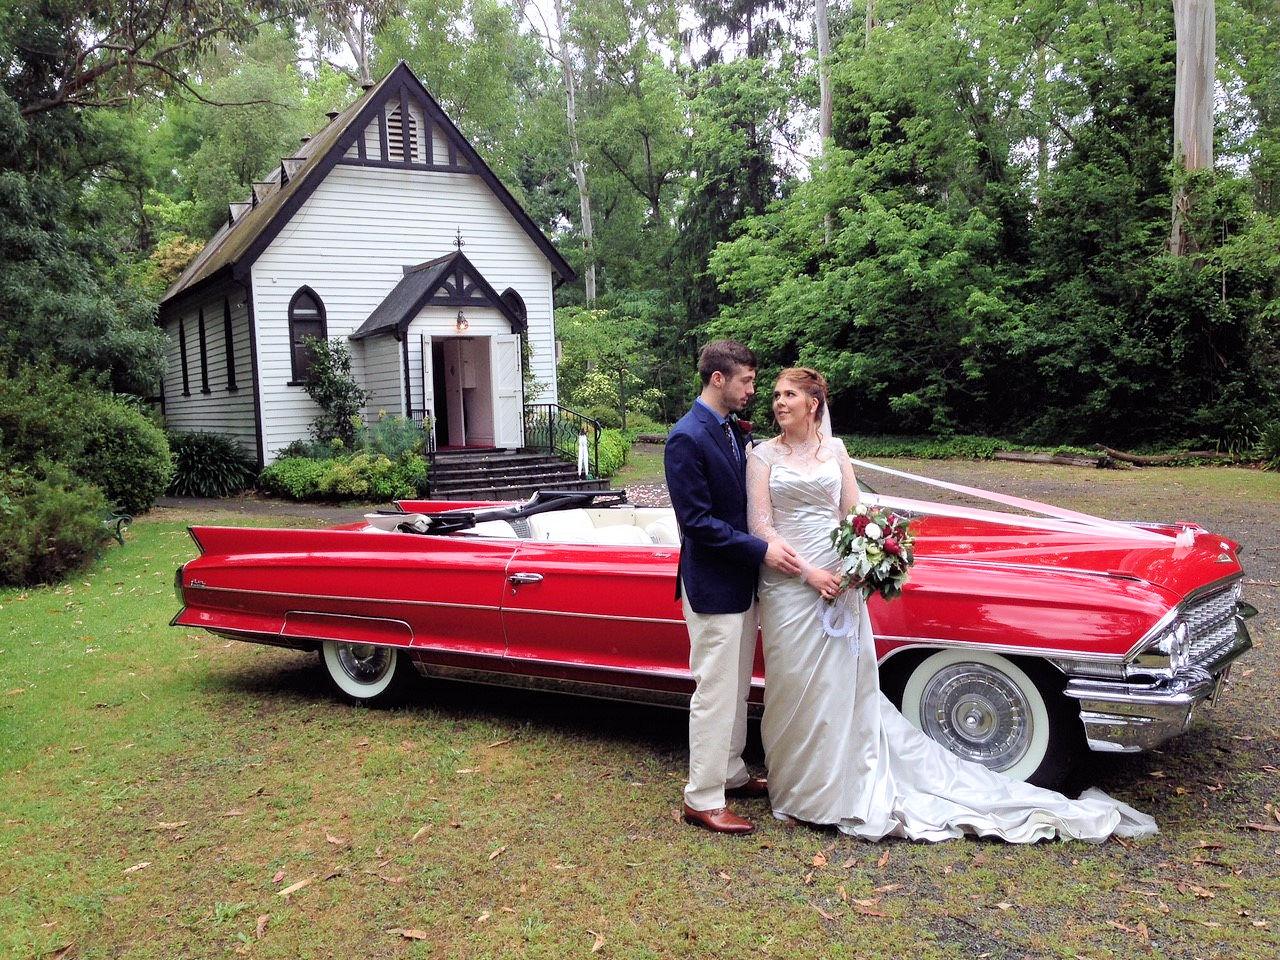 Caddyman Red Convertable Cadillac Opt